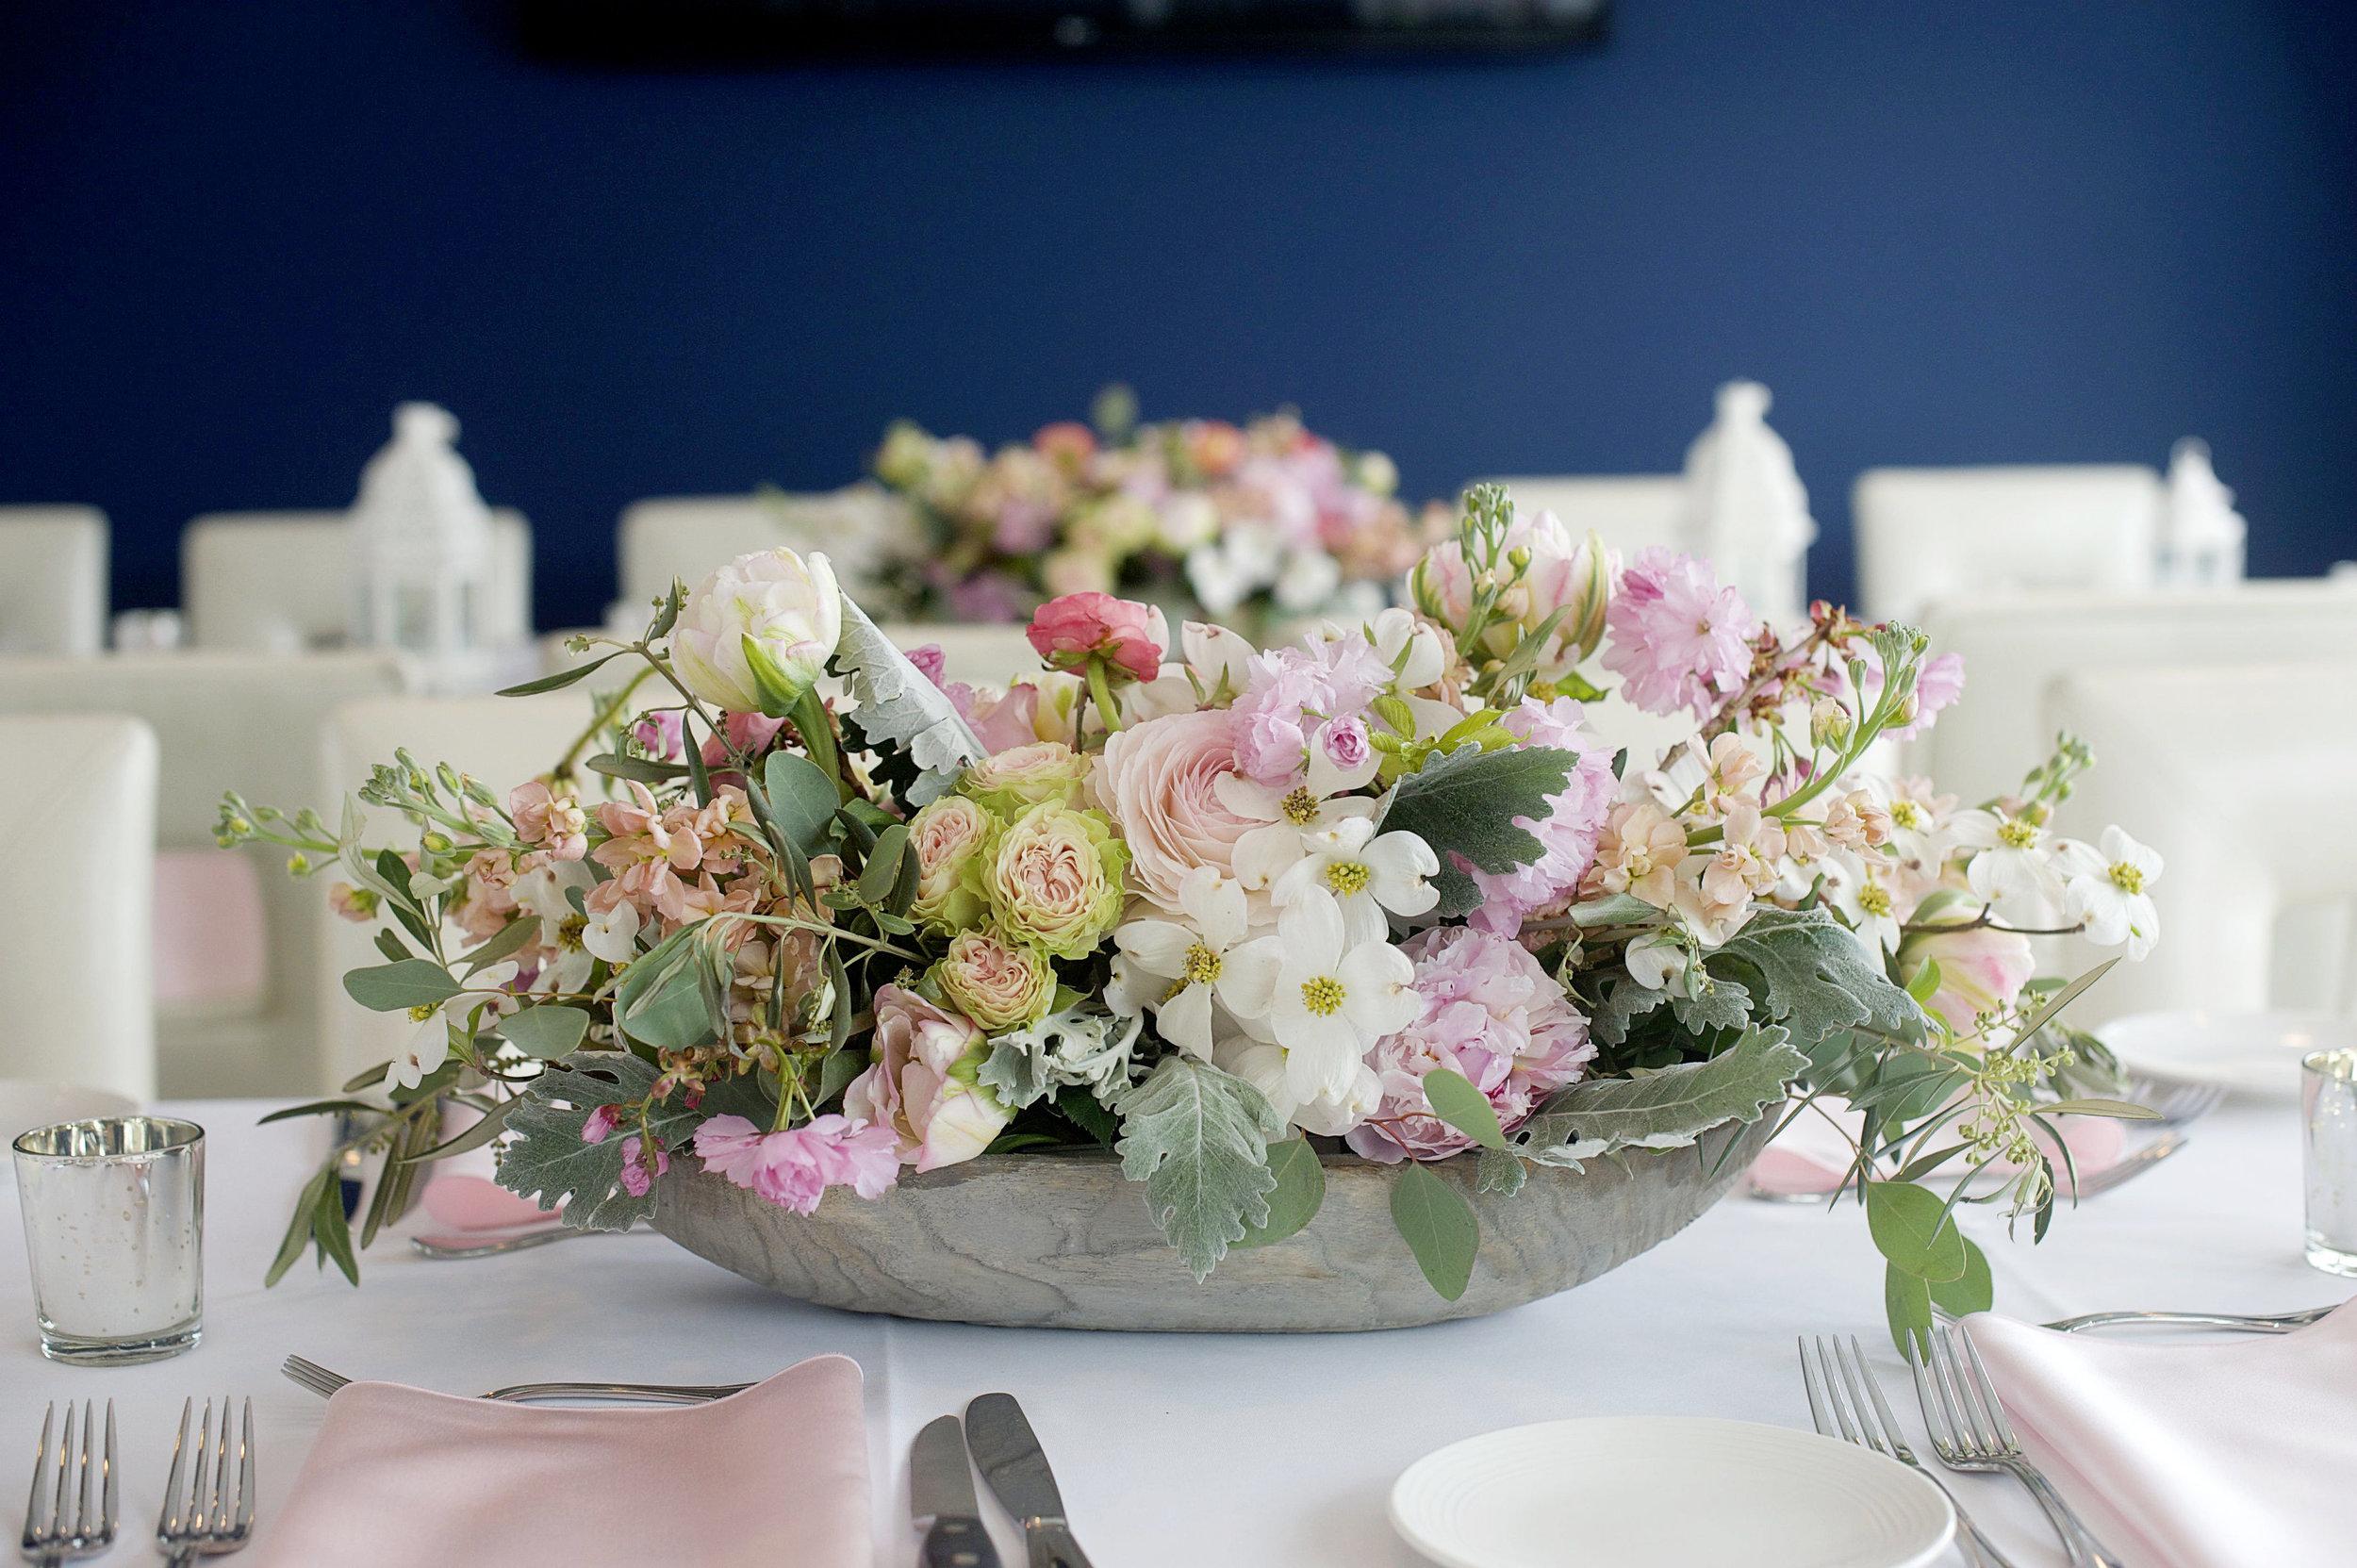 NJ Wedding, Beach Wedding, Avalon Bride, Destination Wedding, Spring Flowers, Blush Flowers, Centerpiece, Table Decor, A Garden Party